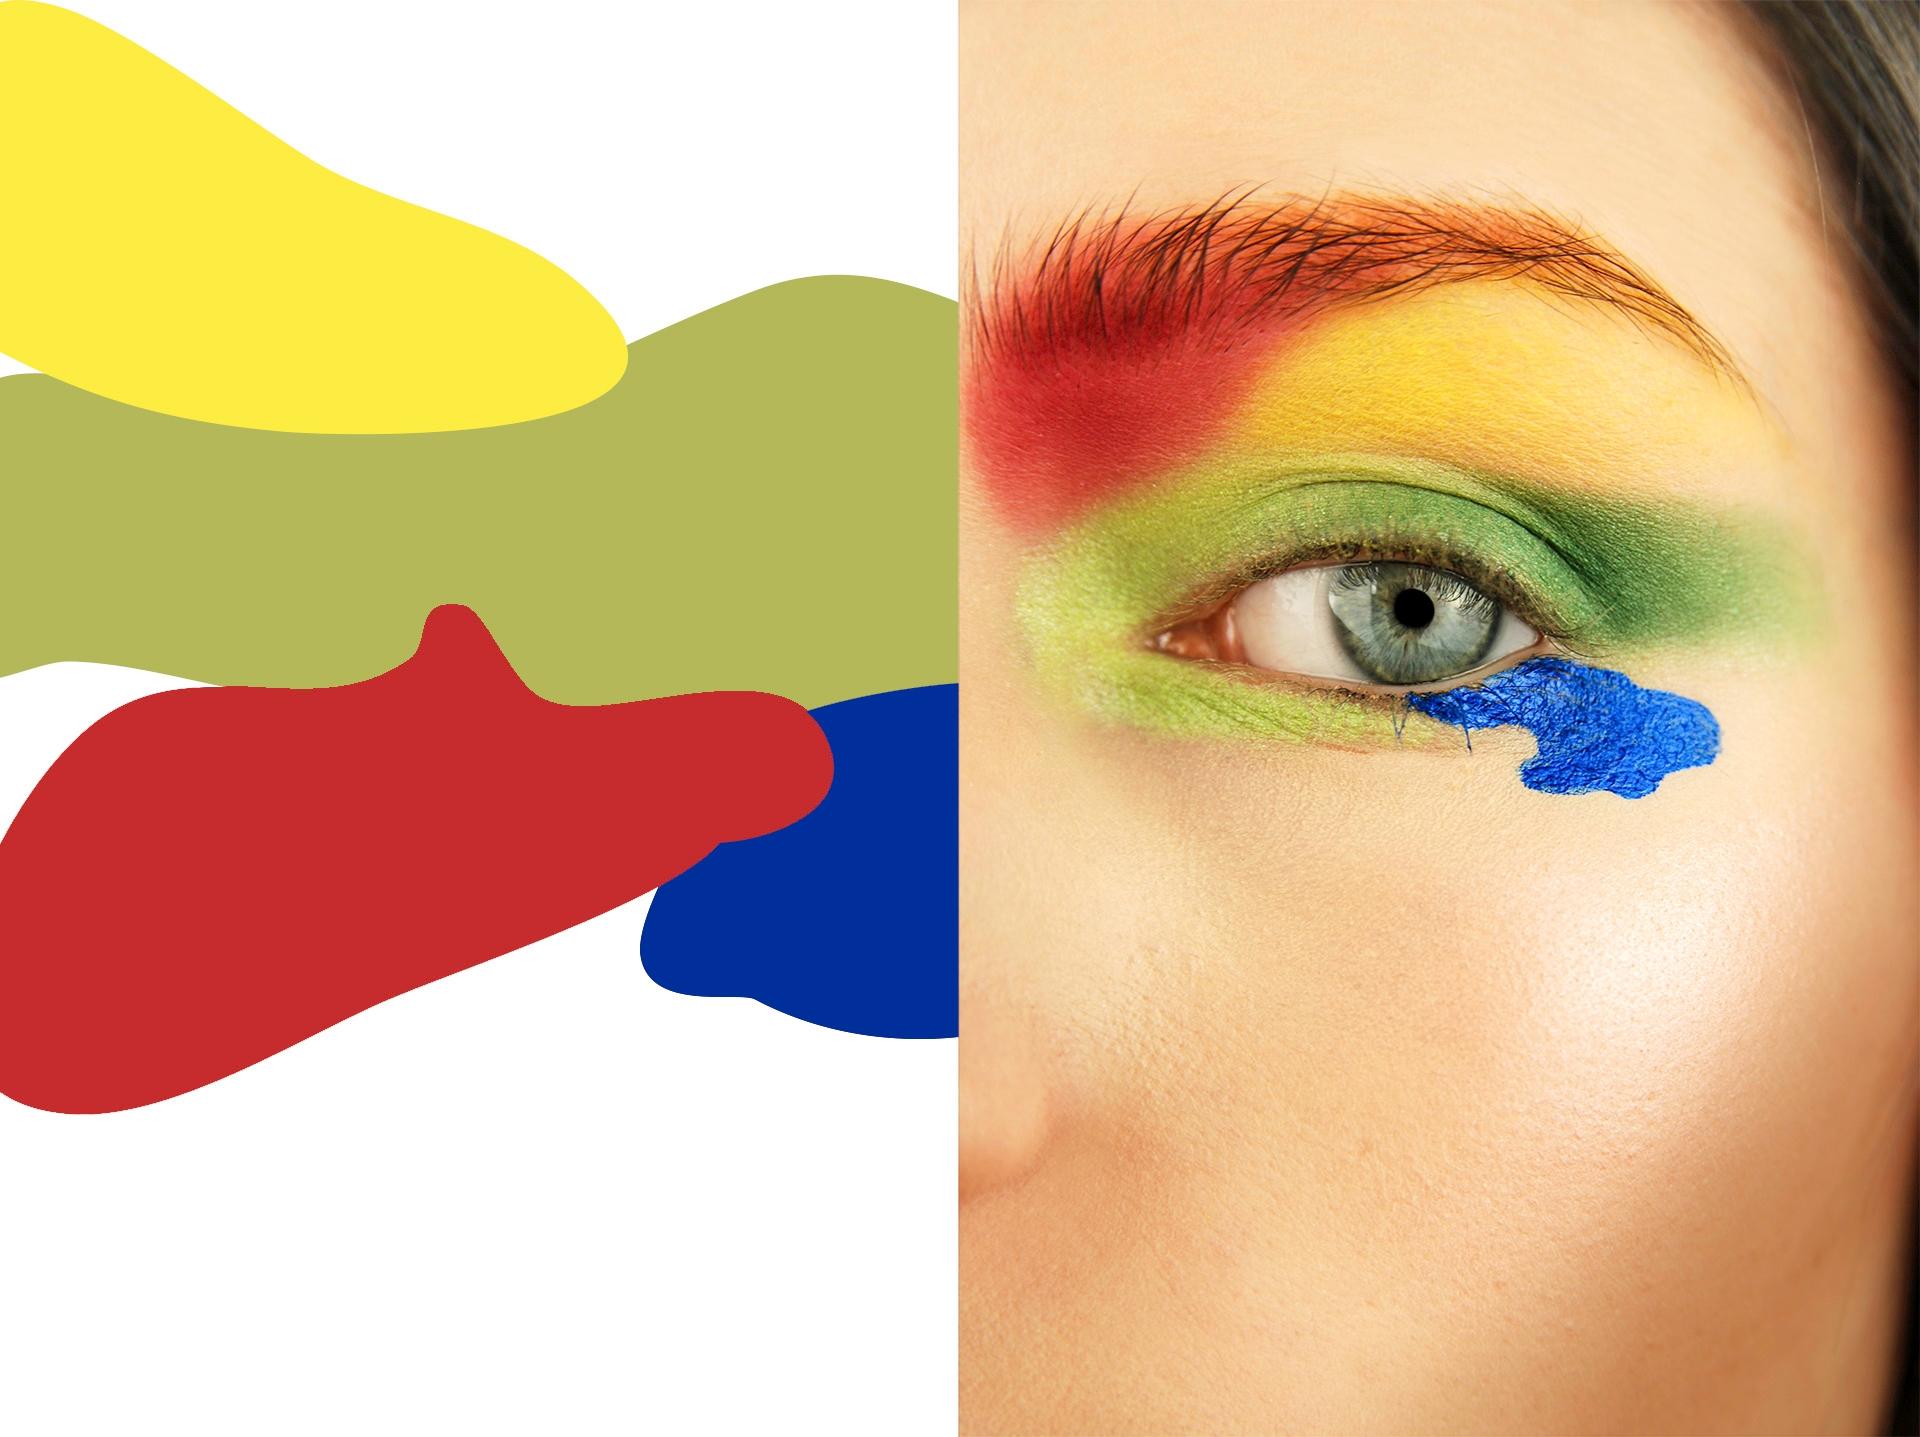 Make-up inspirowany obrazem. 'Tutti Frutti' by Helen_Frankenthaler